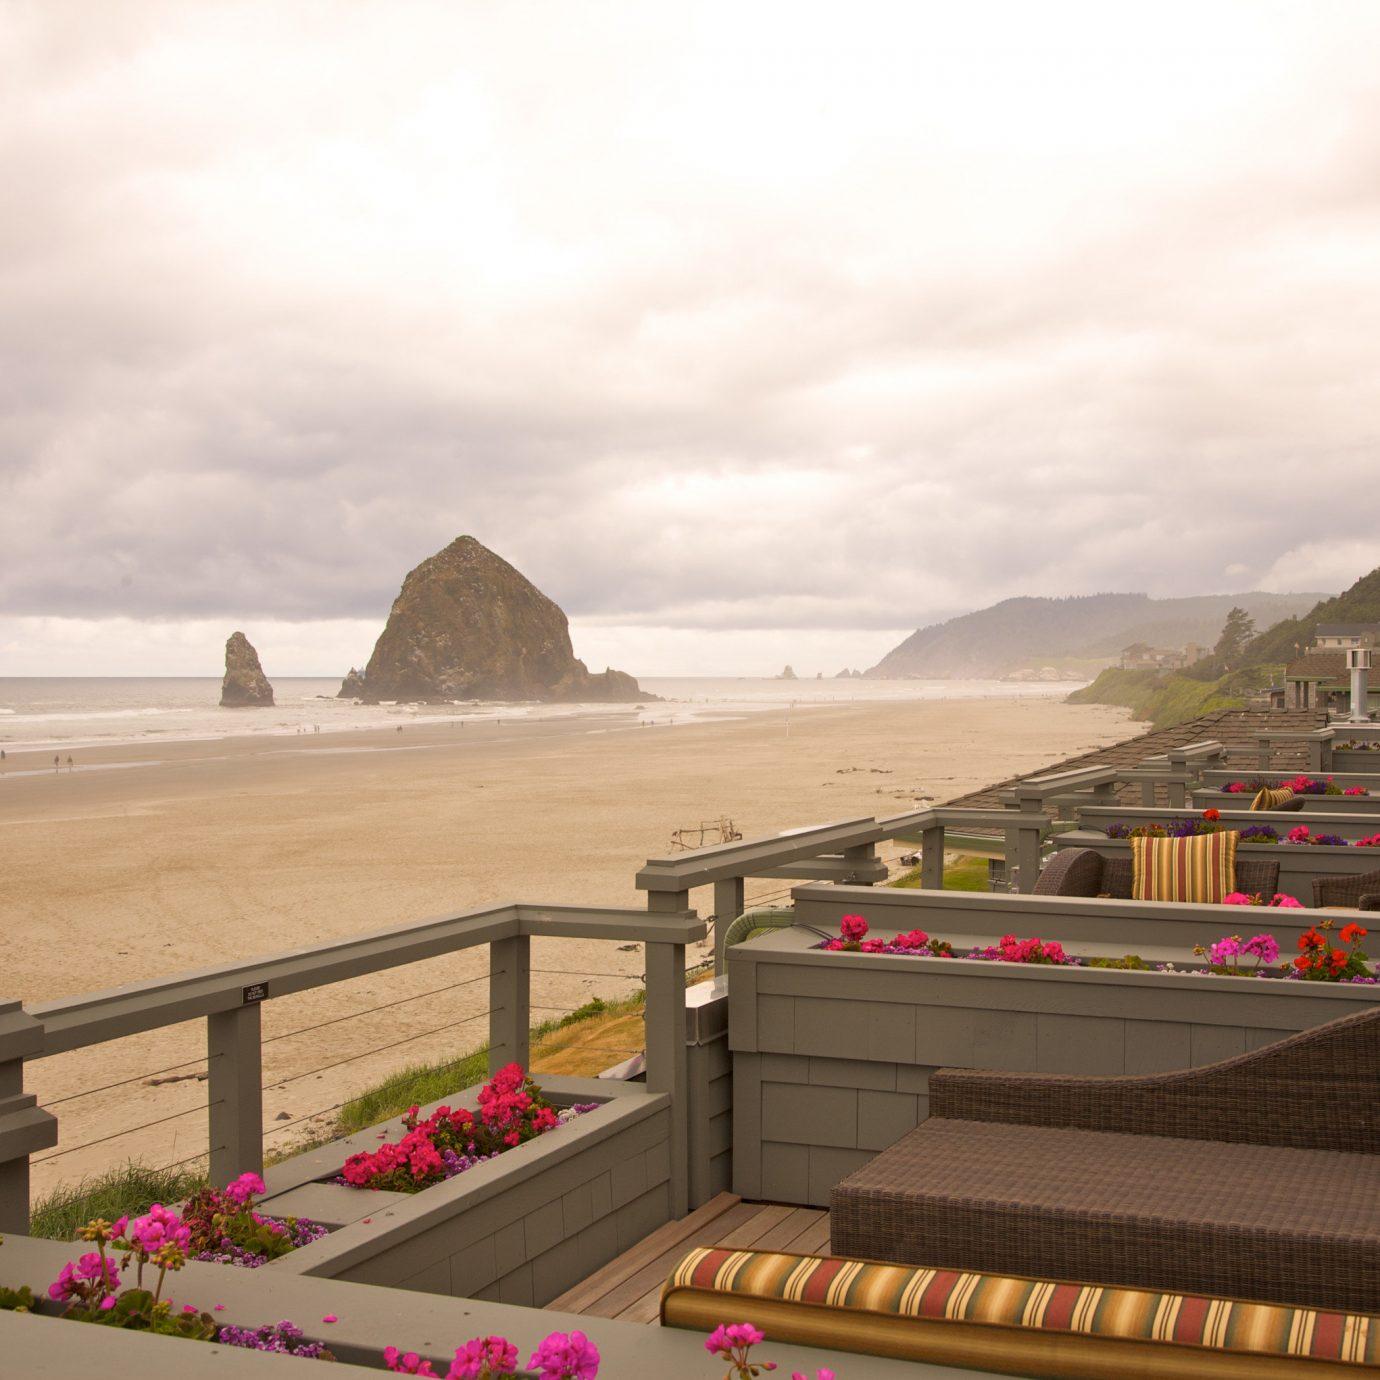 Hotels sky landmark Coast Sea Beach screenshot